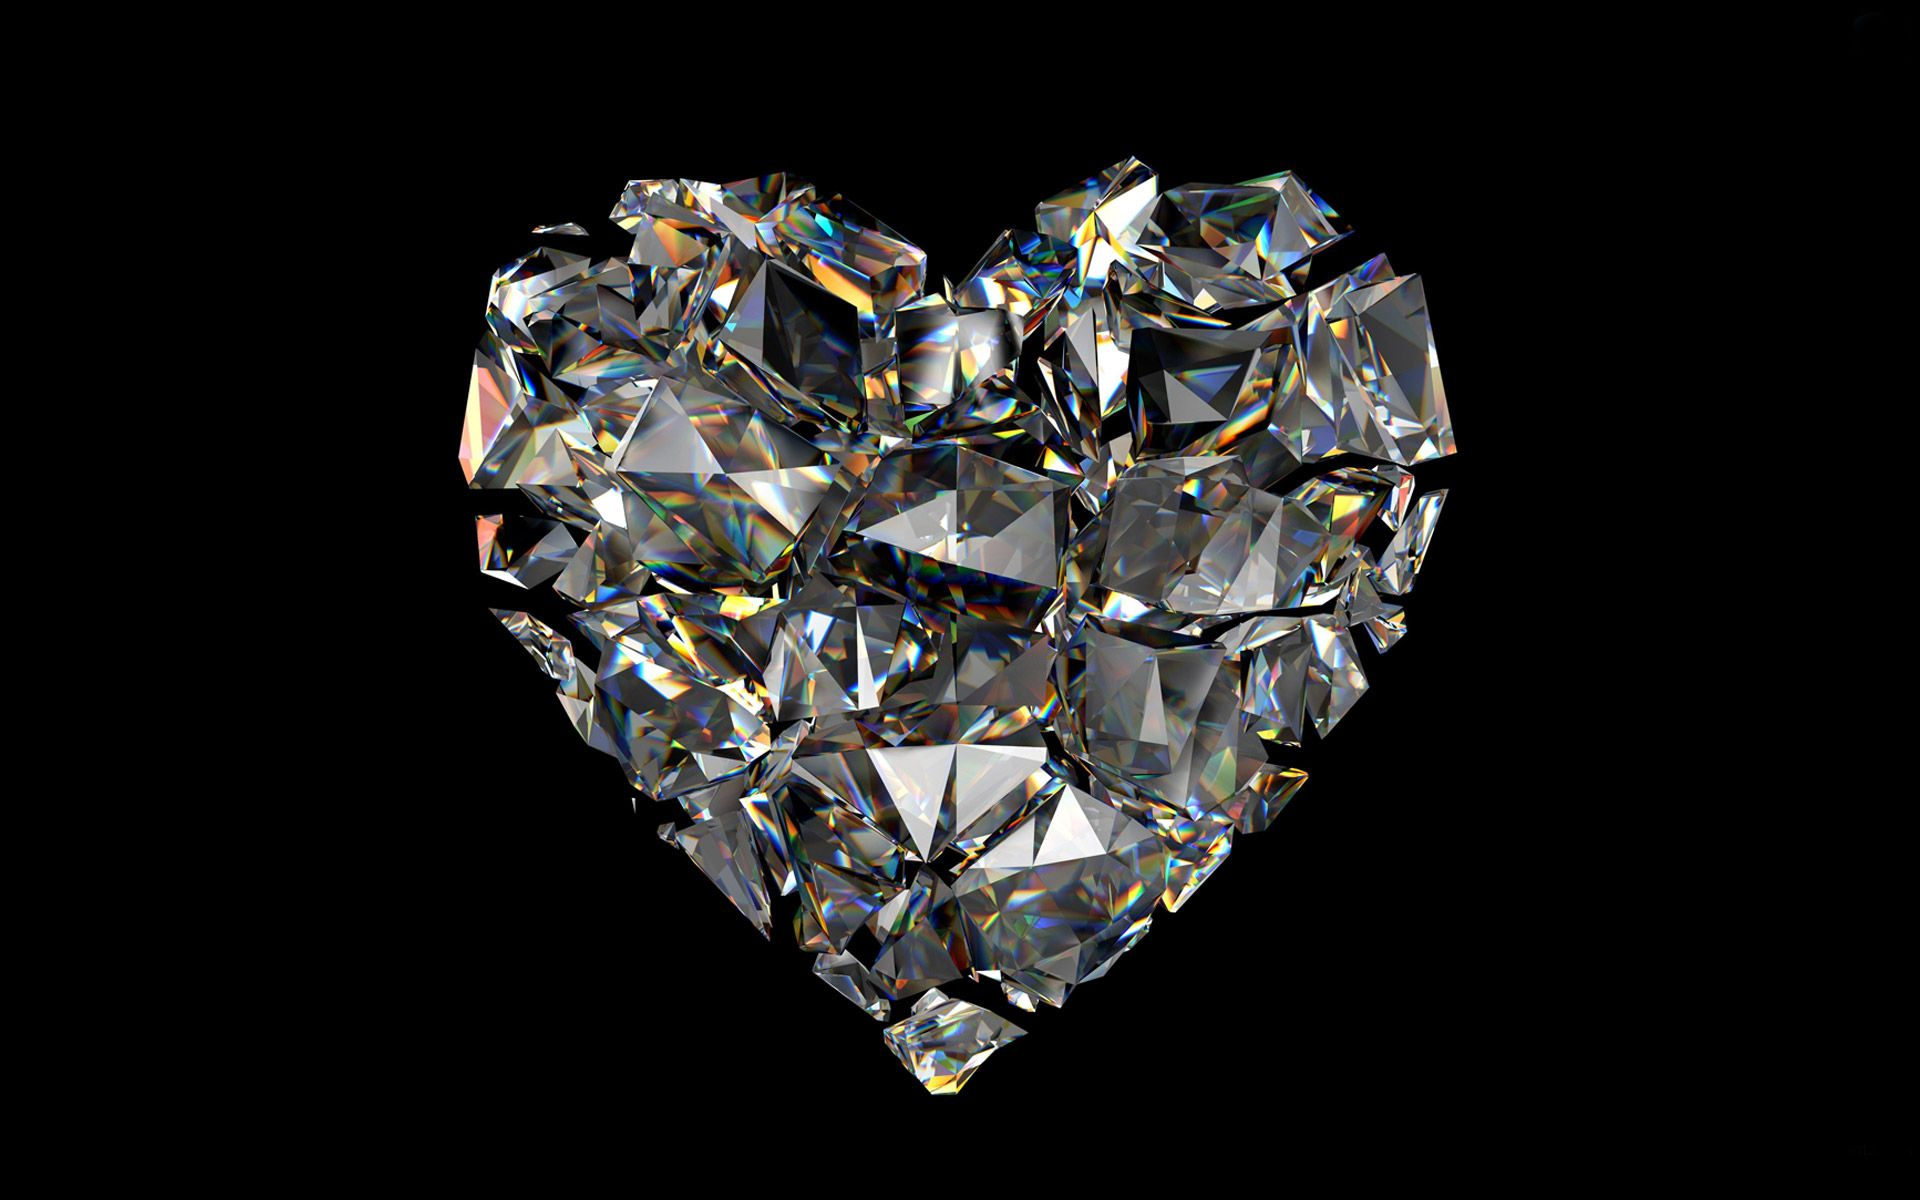 4k Diamond Wallpapers Top Free 4k Diamond Backgrounds